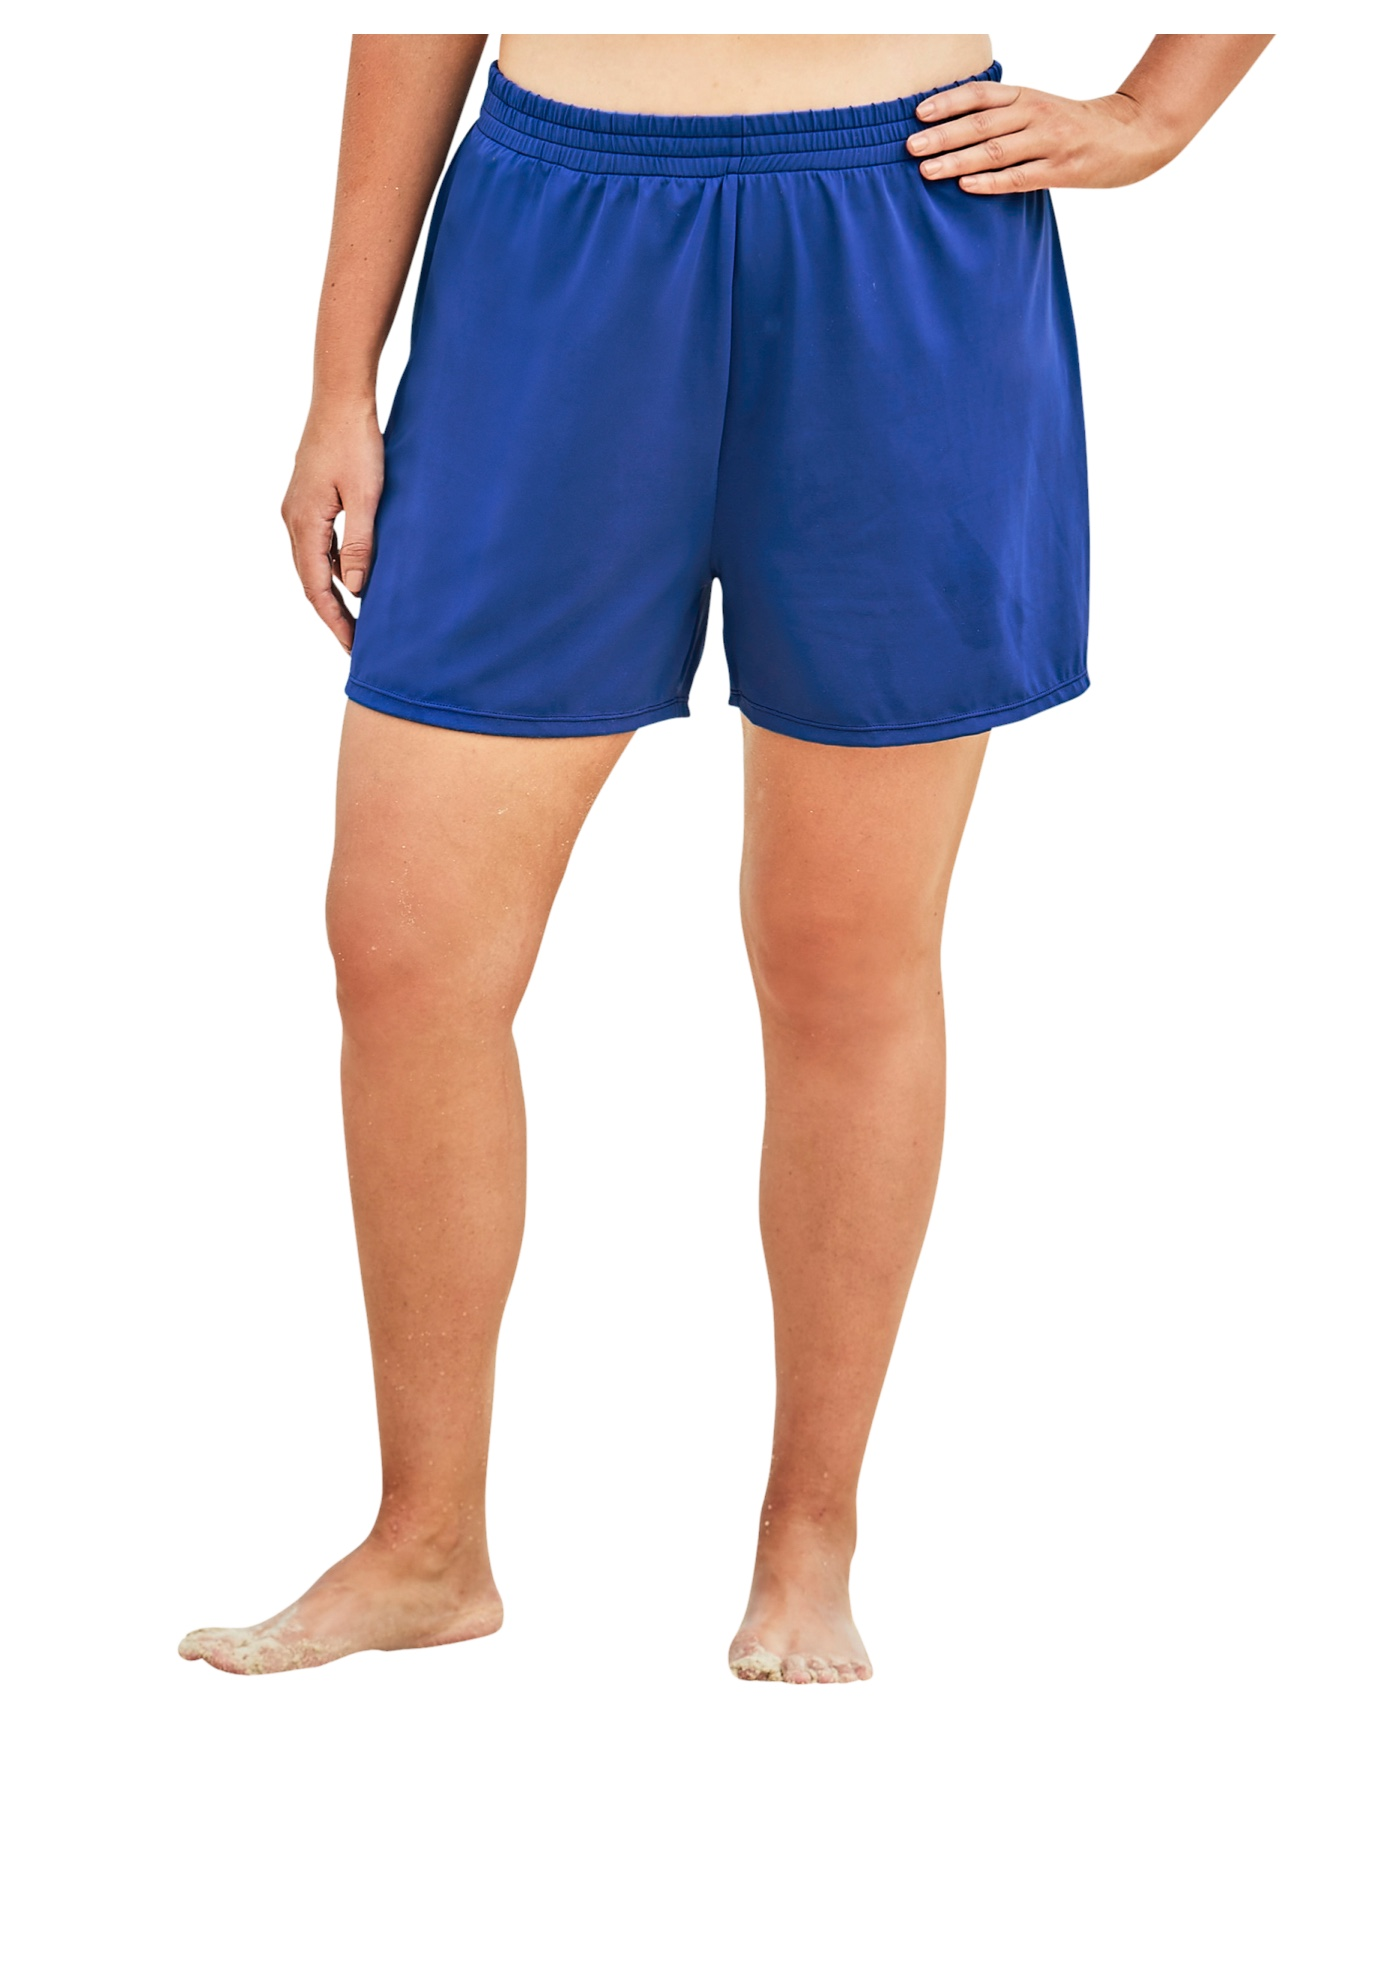 Plus Size Women's Boxer Swim Short by Swim 365 in Dream Blue